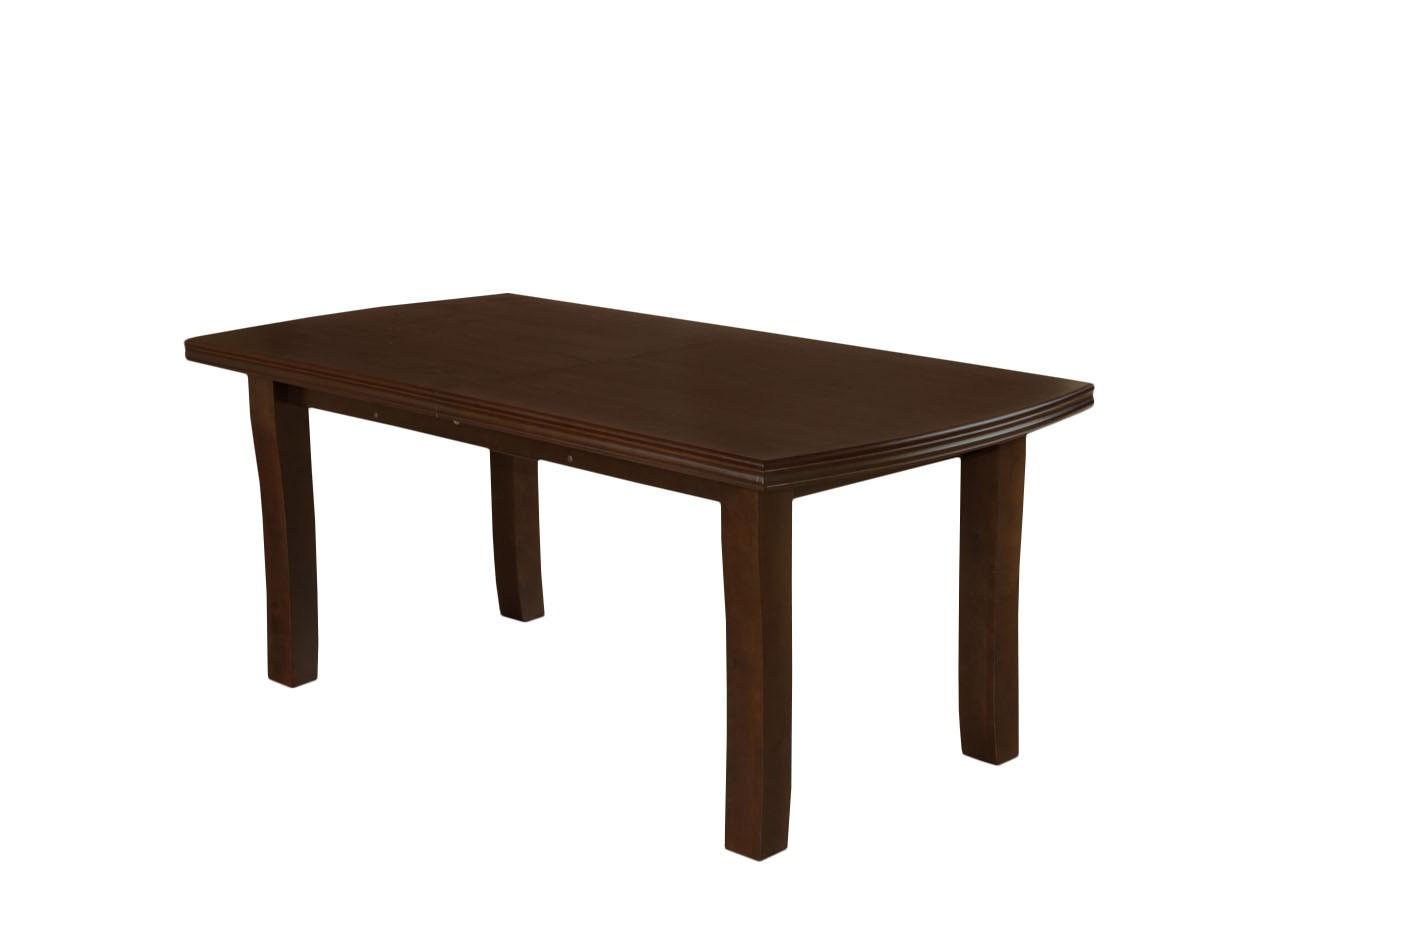 Stól SM13 nogi lite drewno rozkładany do 300 cm